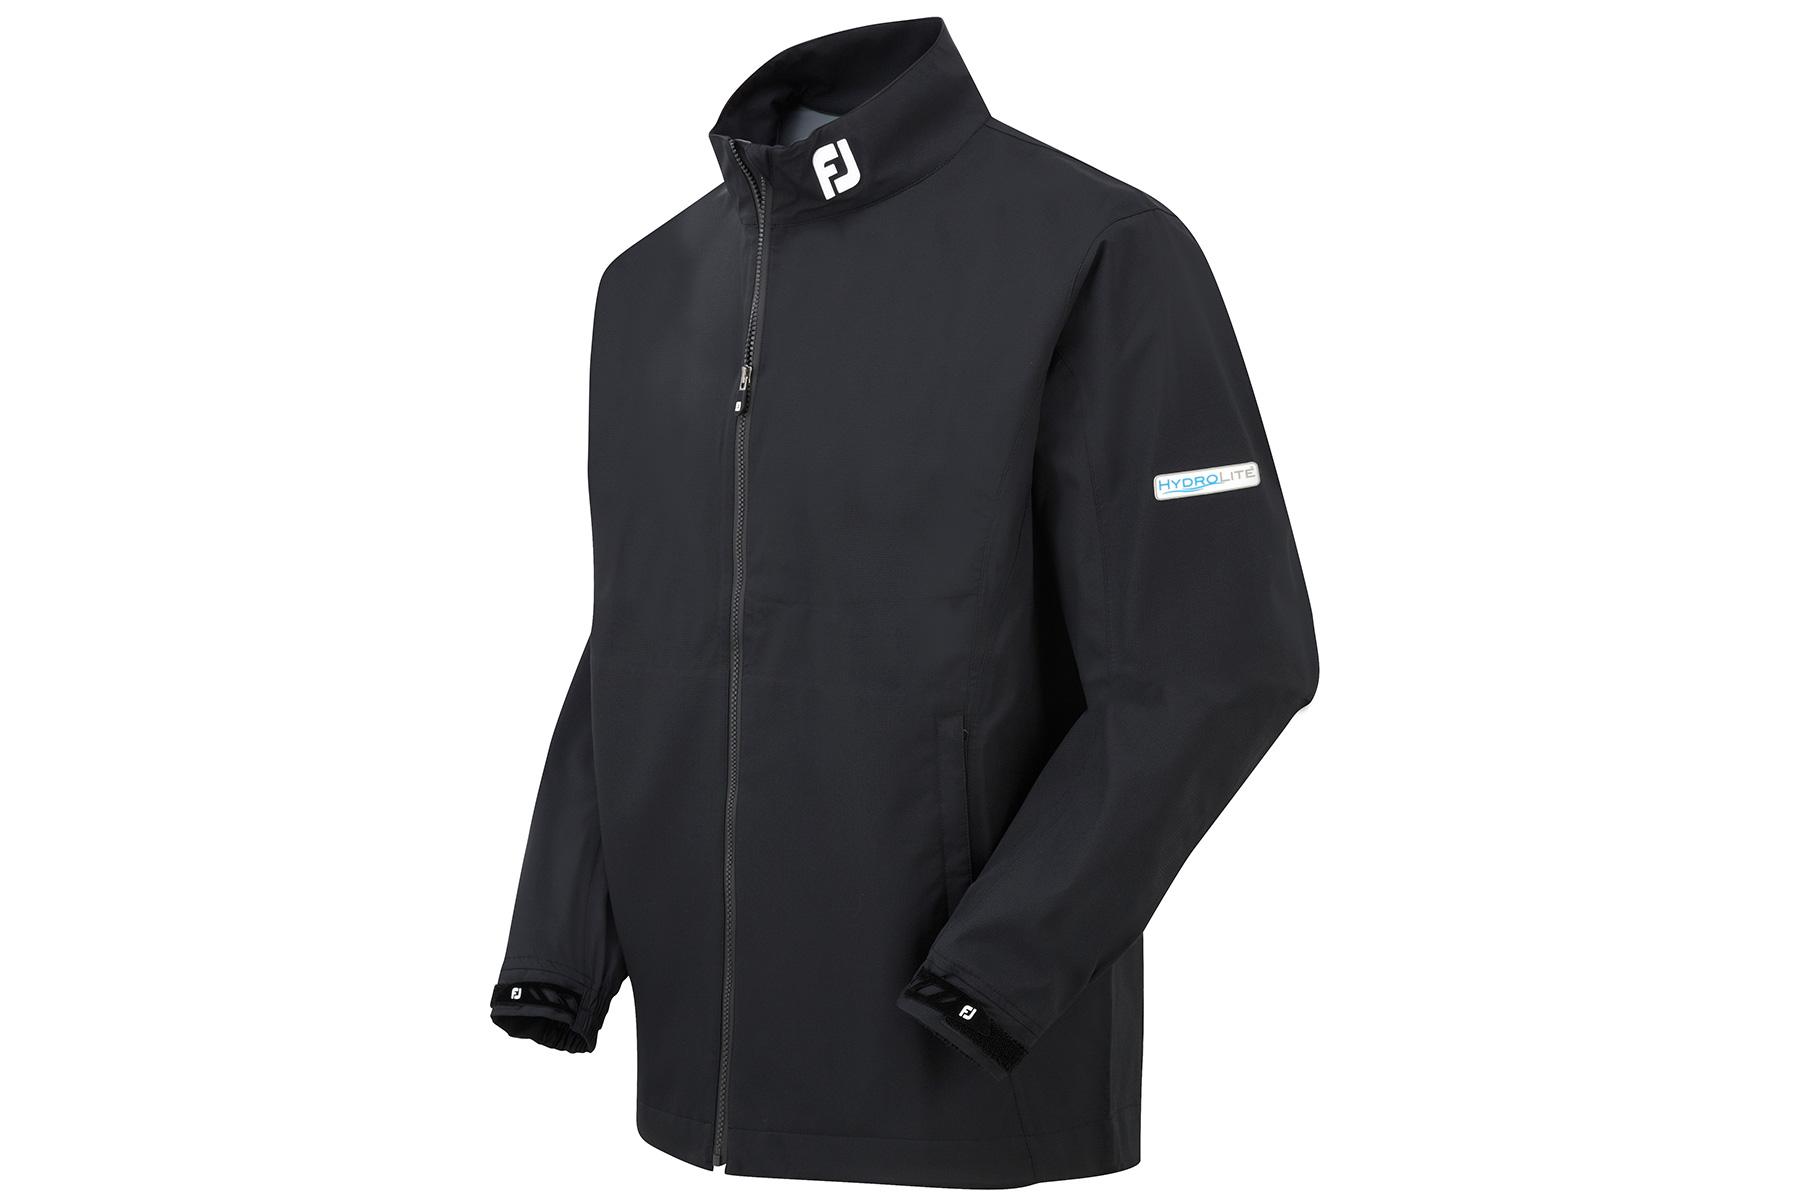 Footjoy Hydrolite Rain Jacket From American Golf